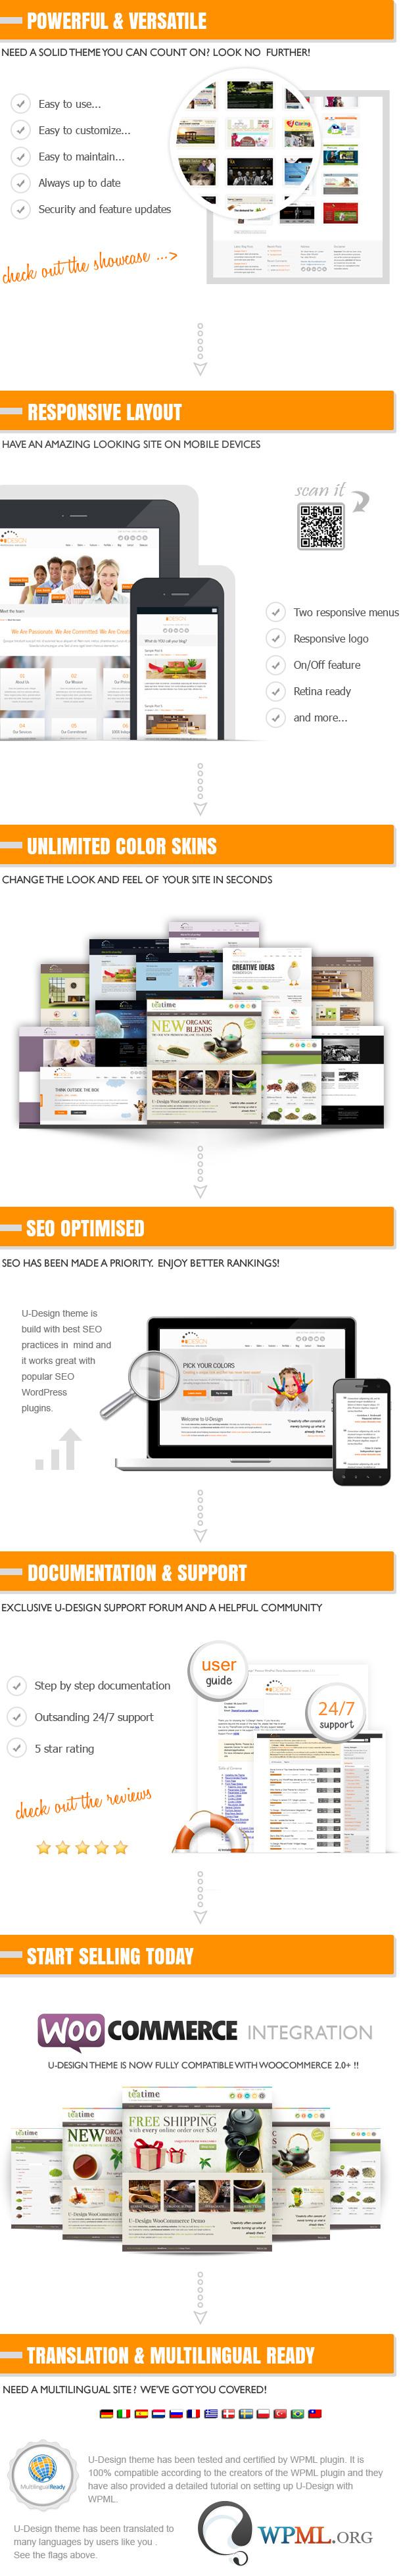 udesign3 - uDesign - Responsive WordPress Theme